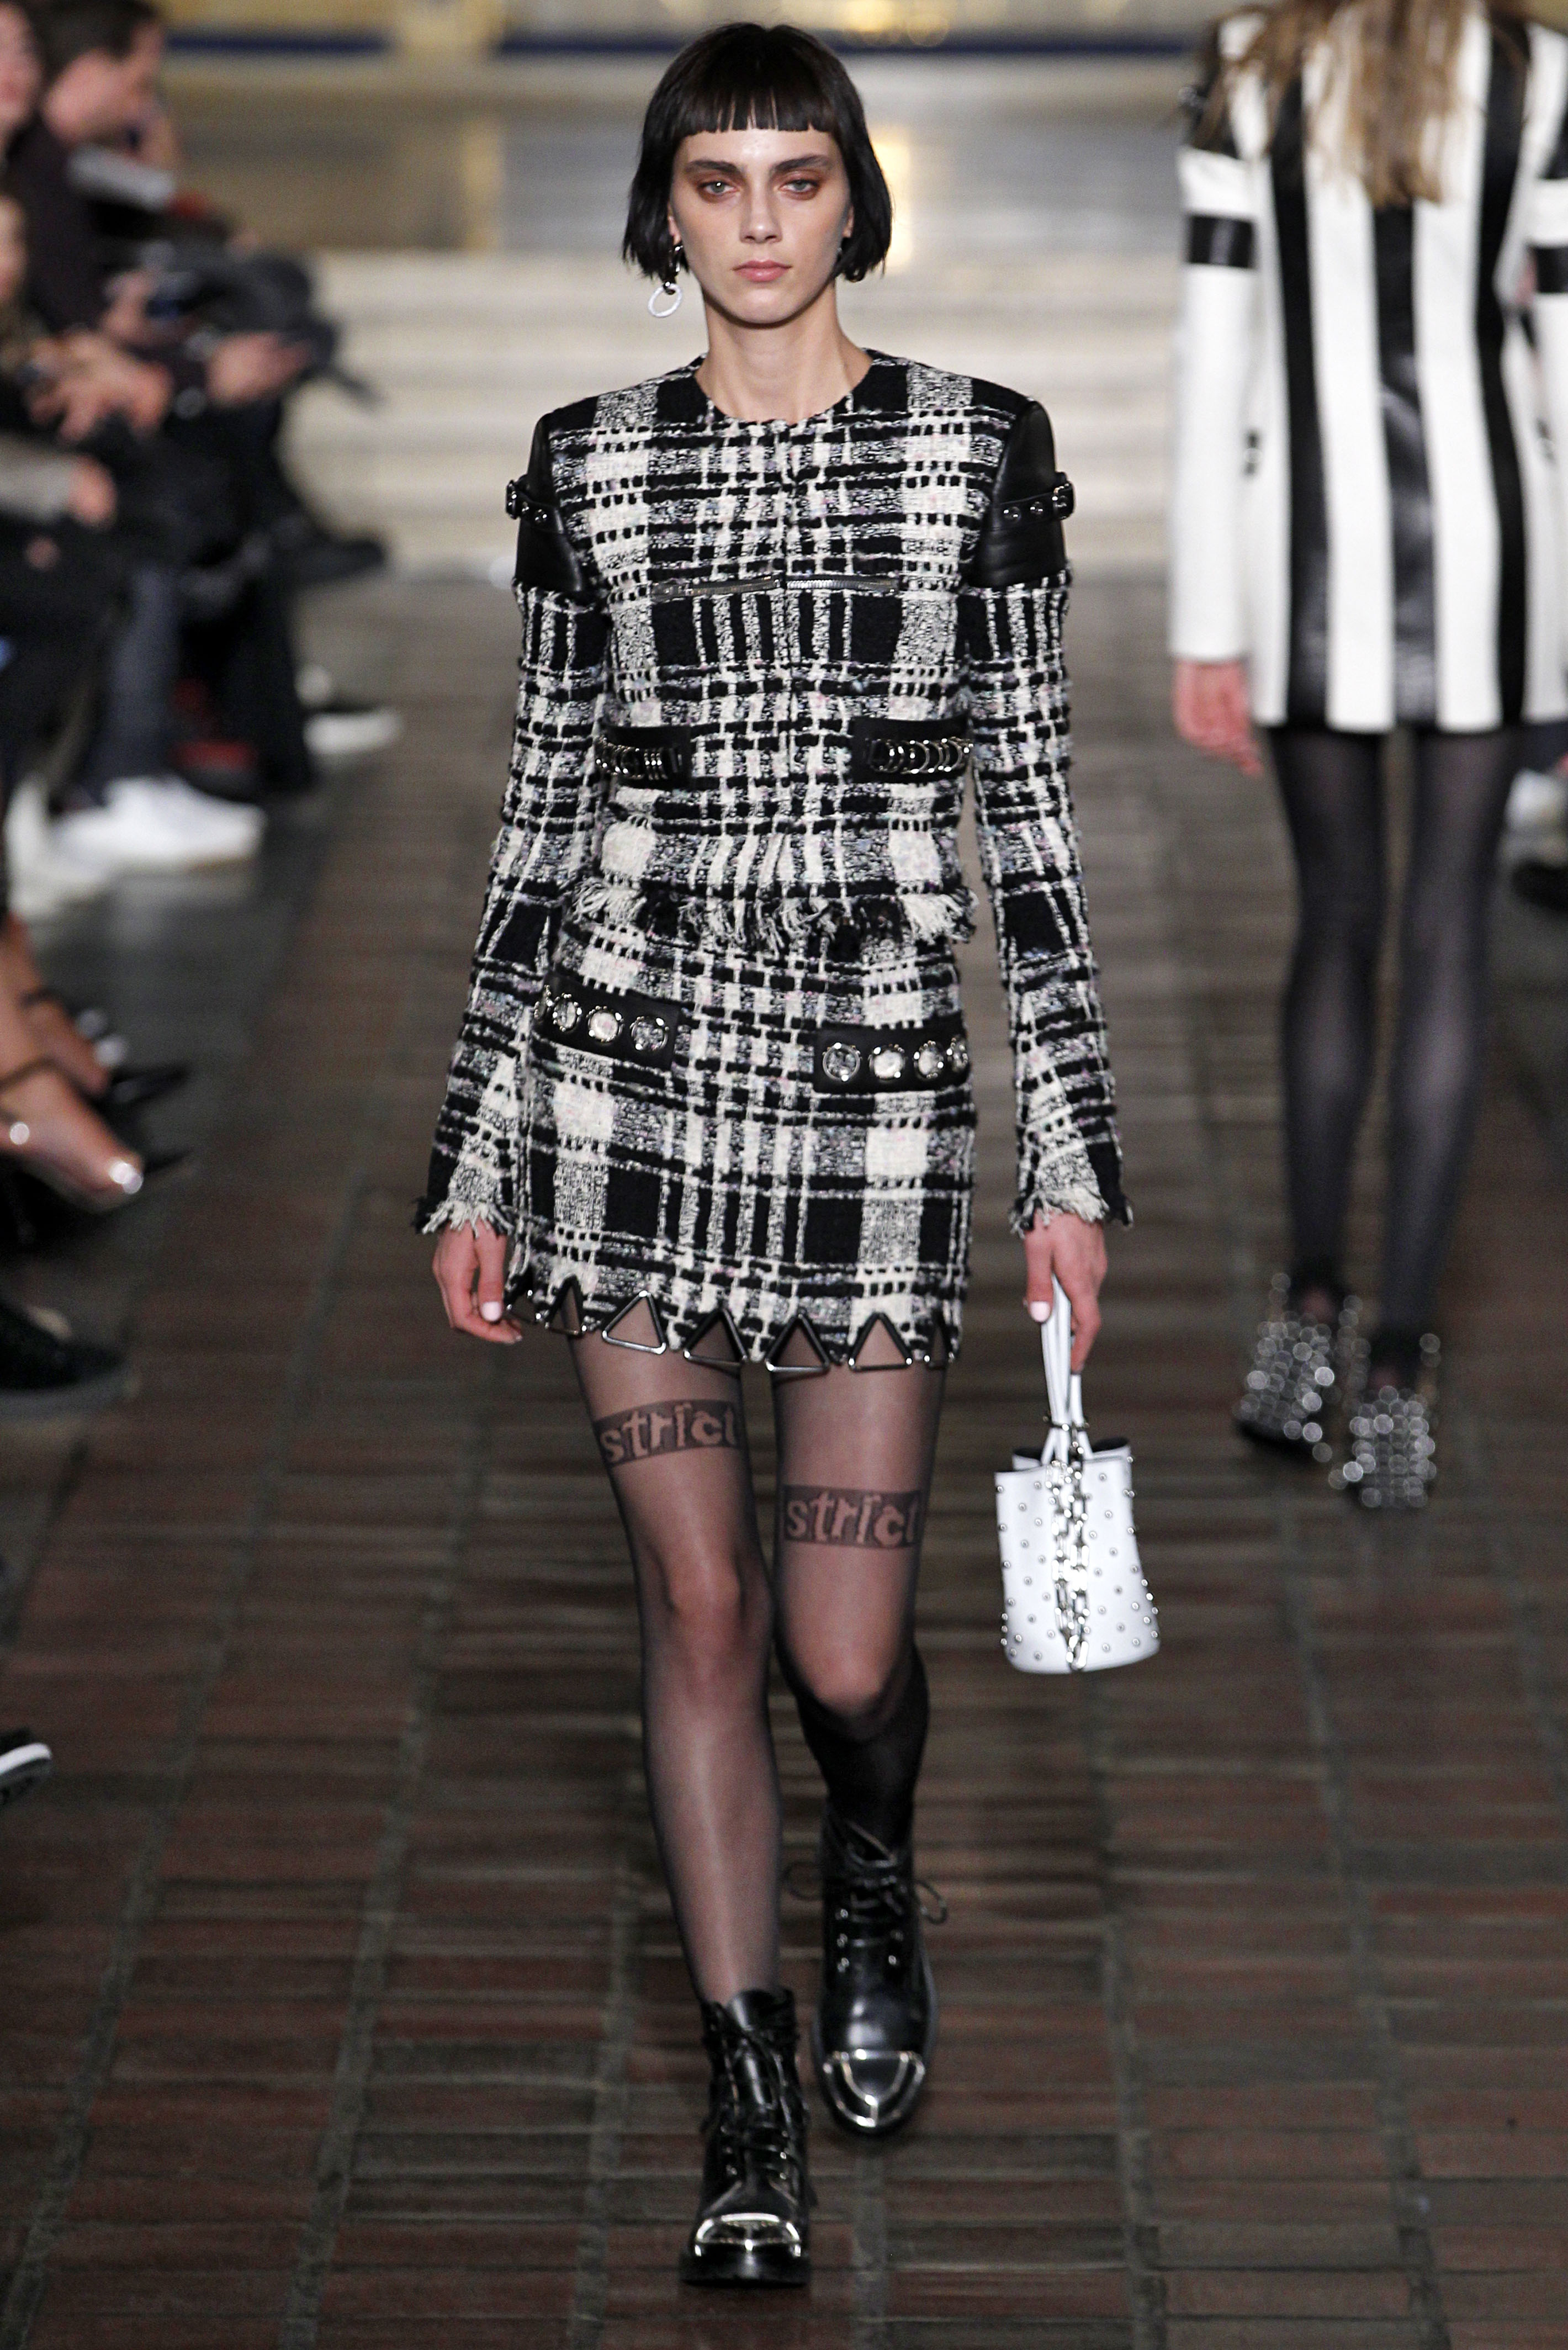 Alexander Wang - Runway - Fall/Winter 2016 New York Fashion Week